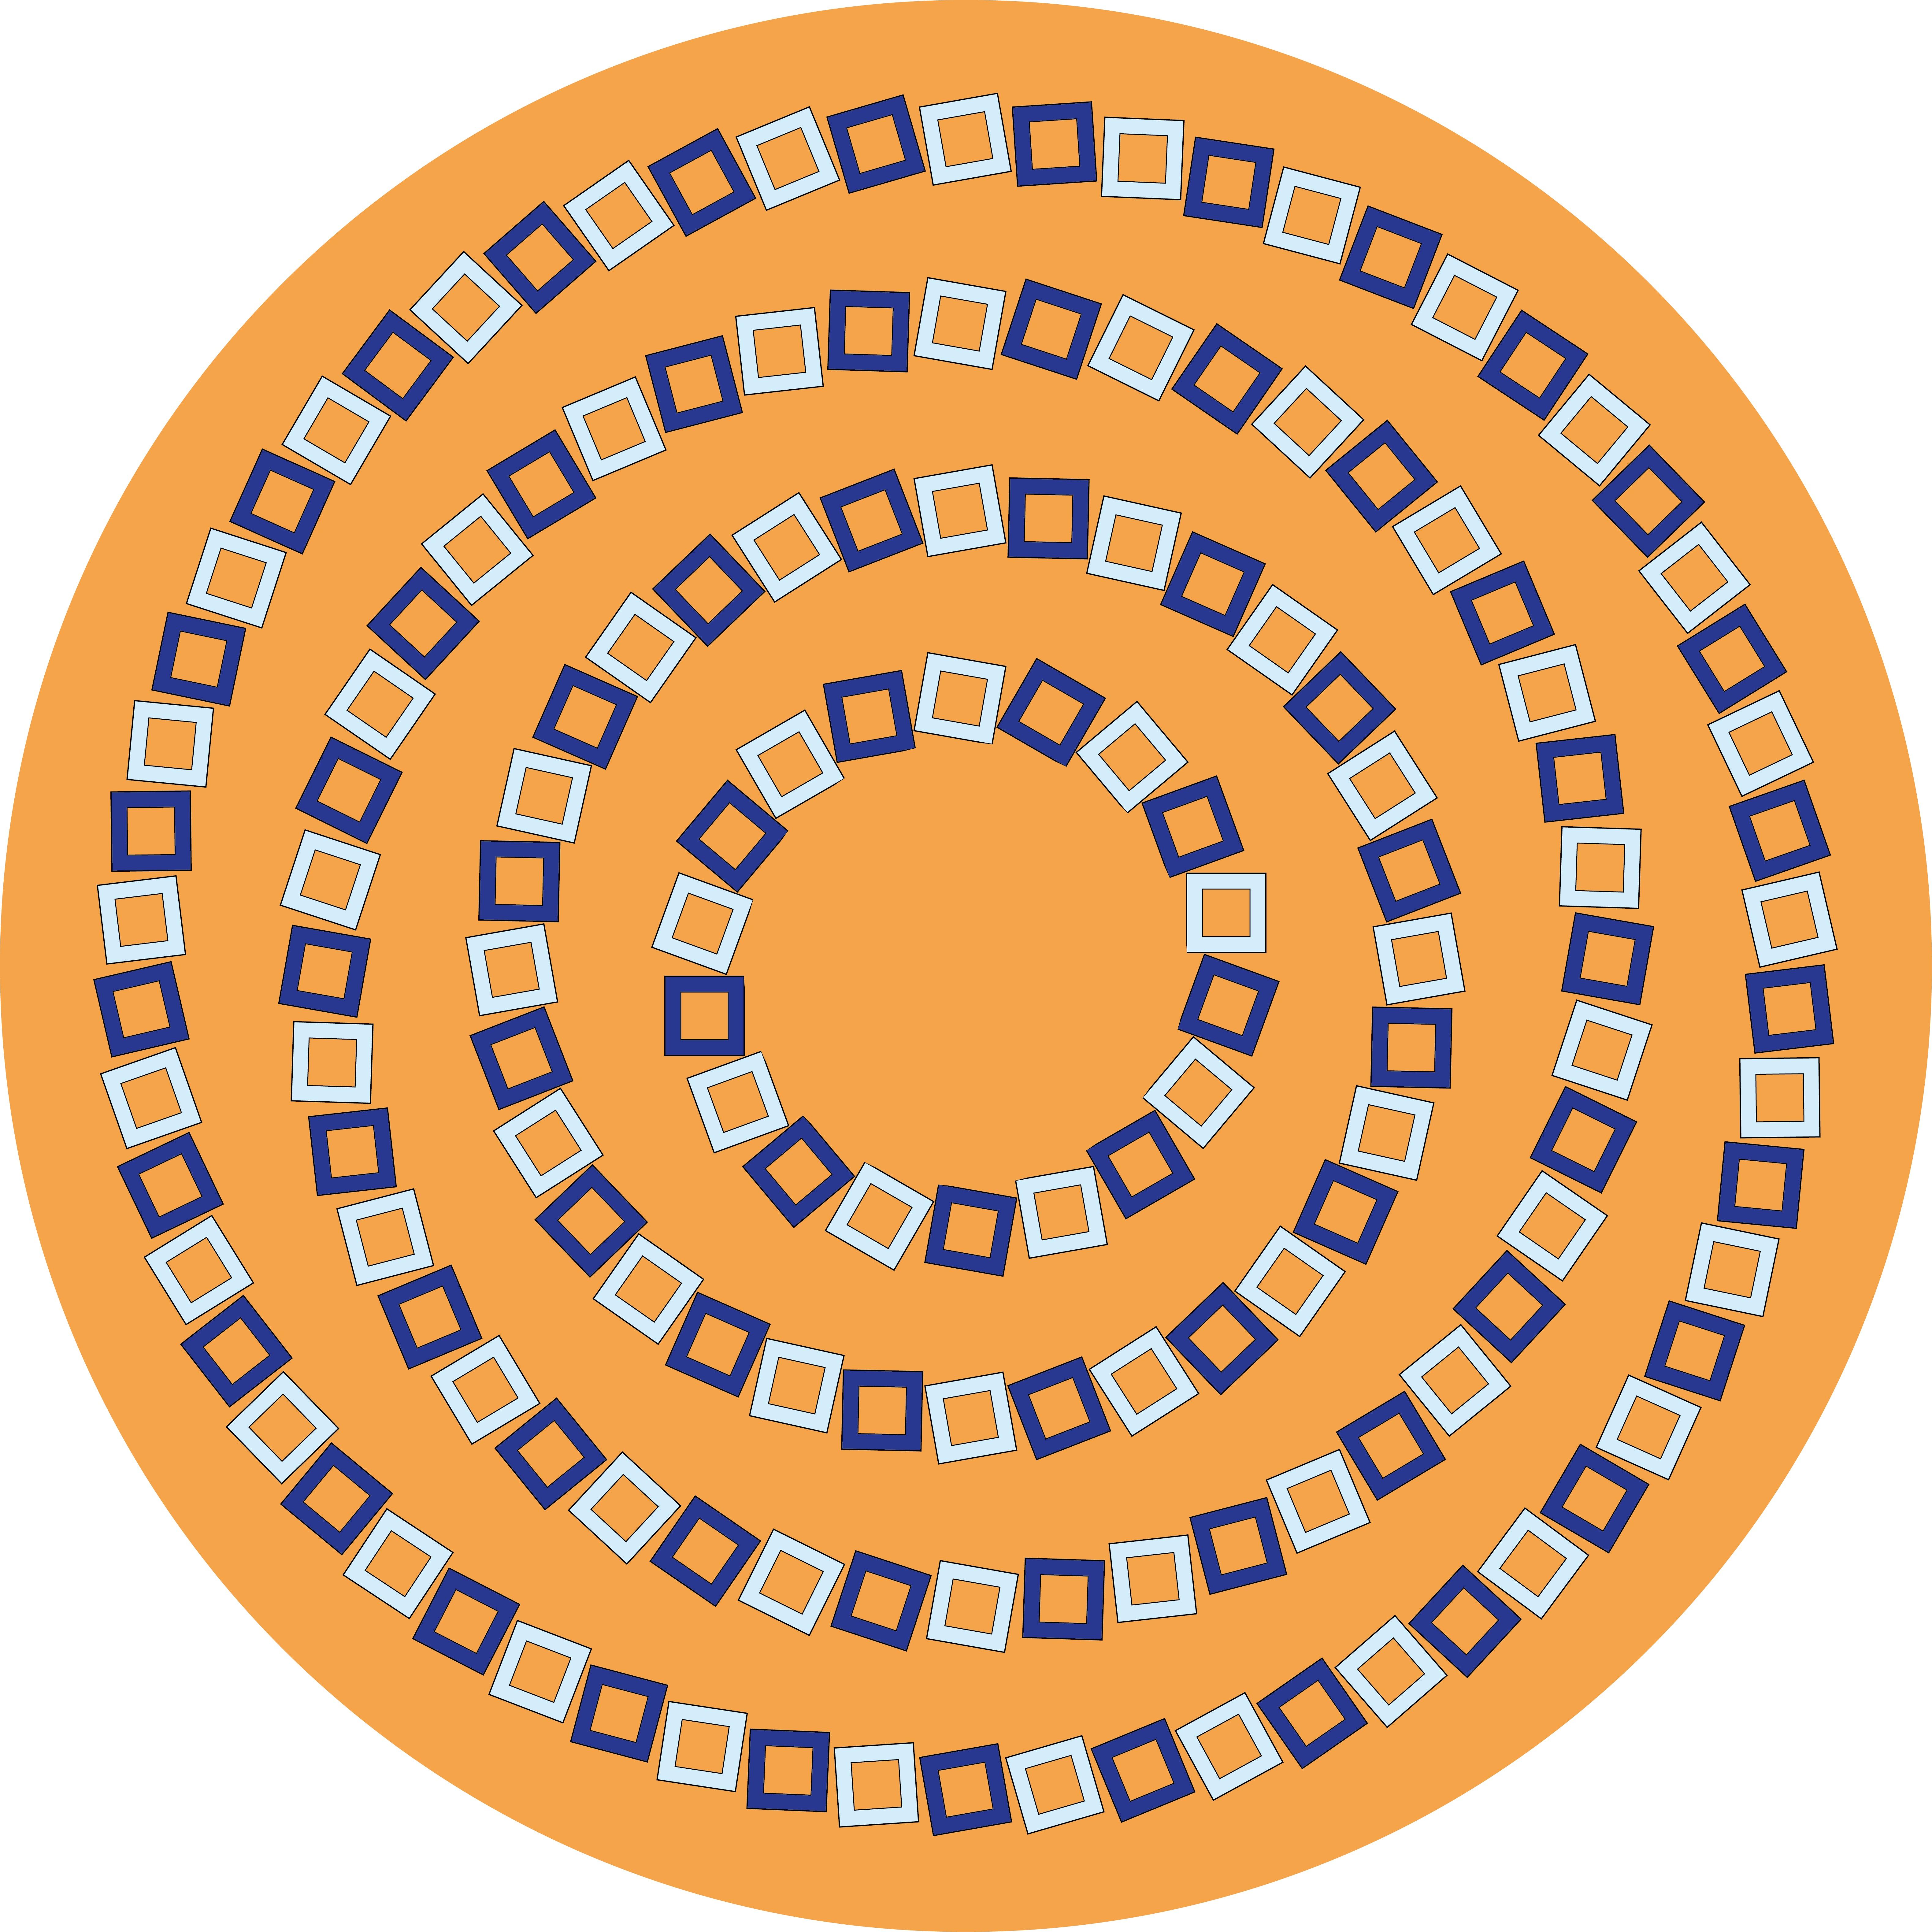 Illusion clipart vertigo Messygoat jpg – Vertigo img_2319